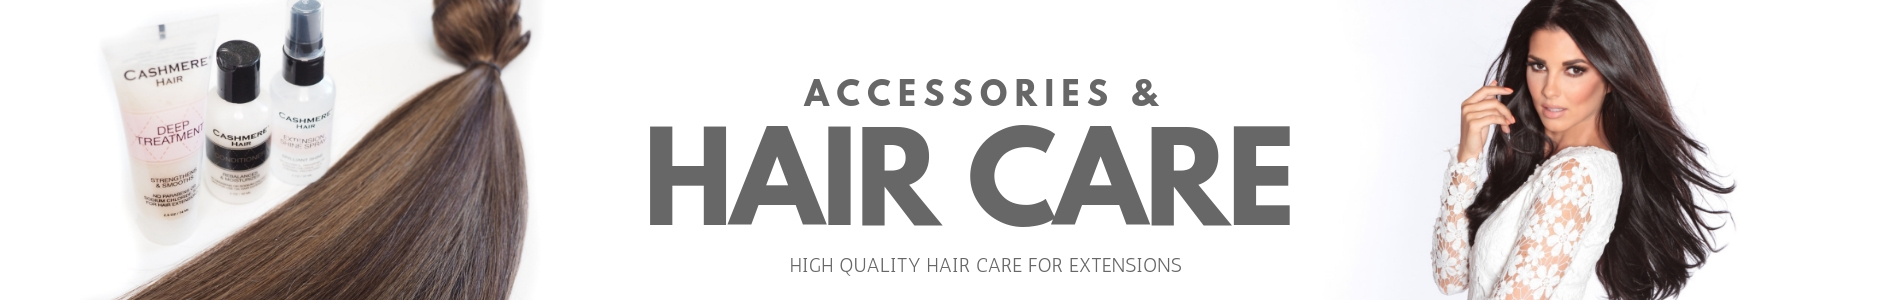 haircare7.jpg